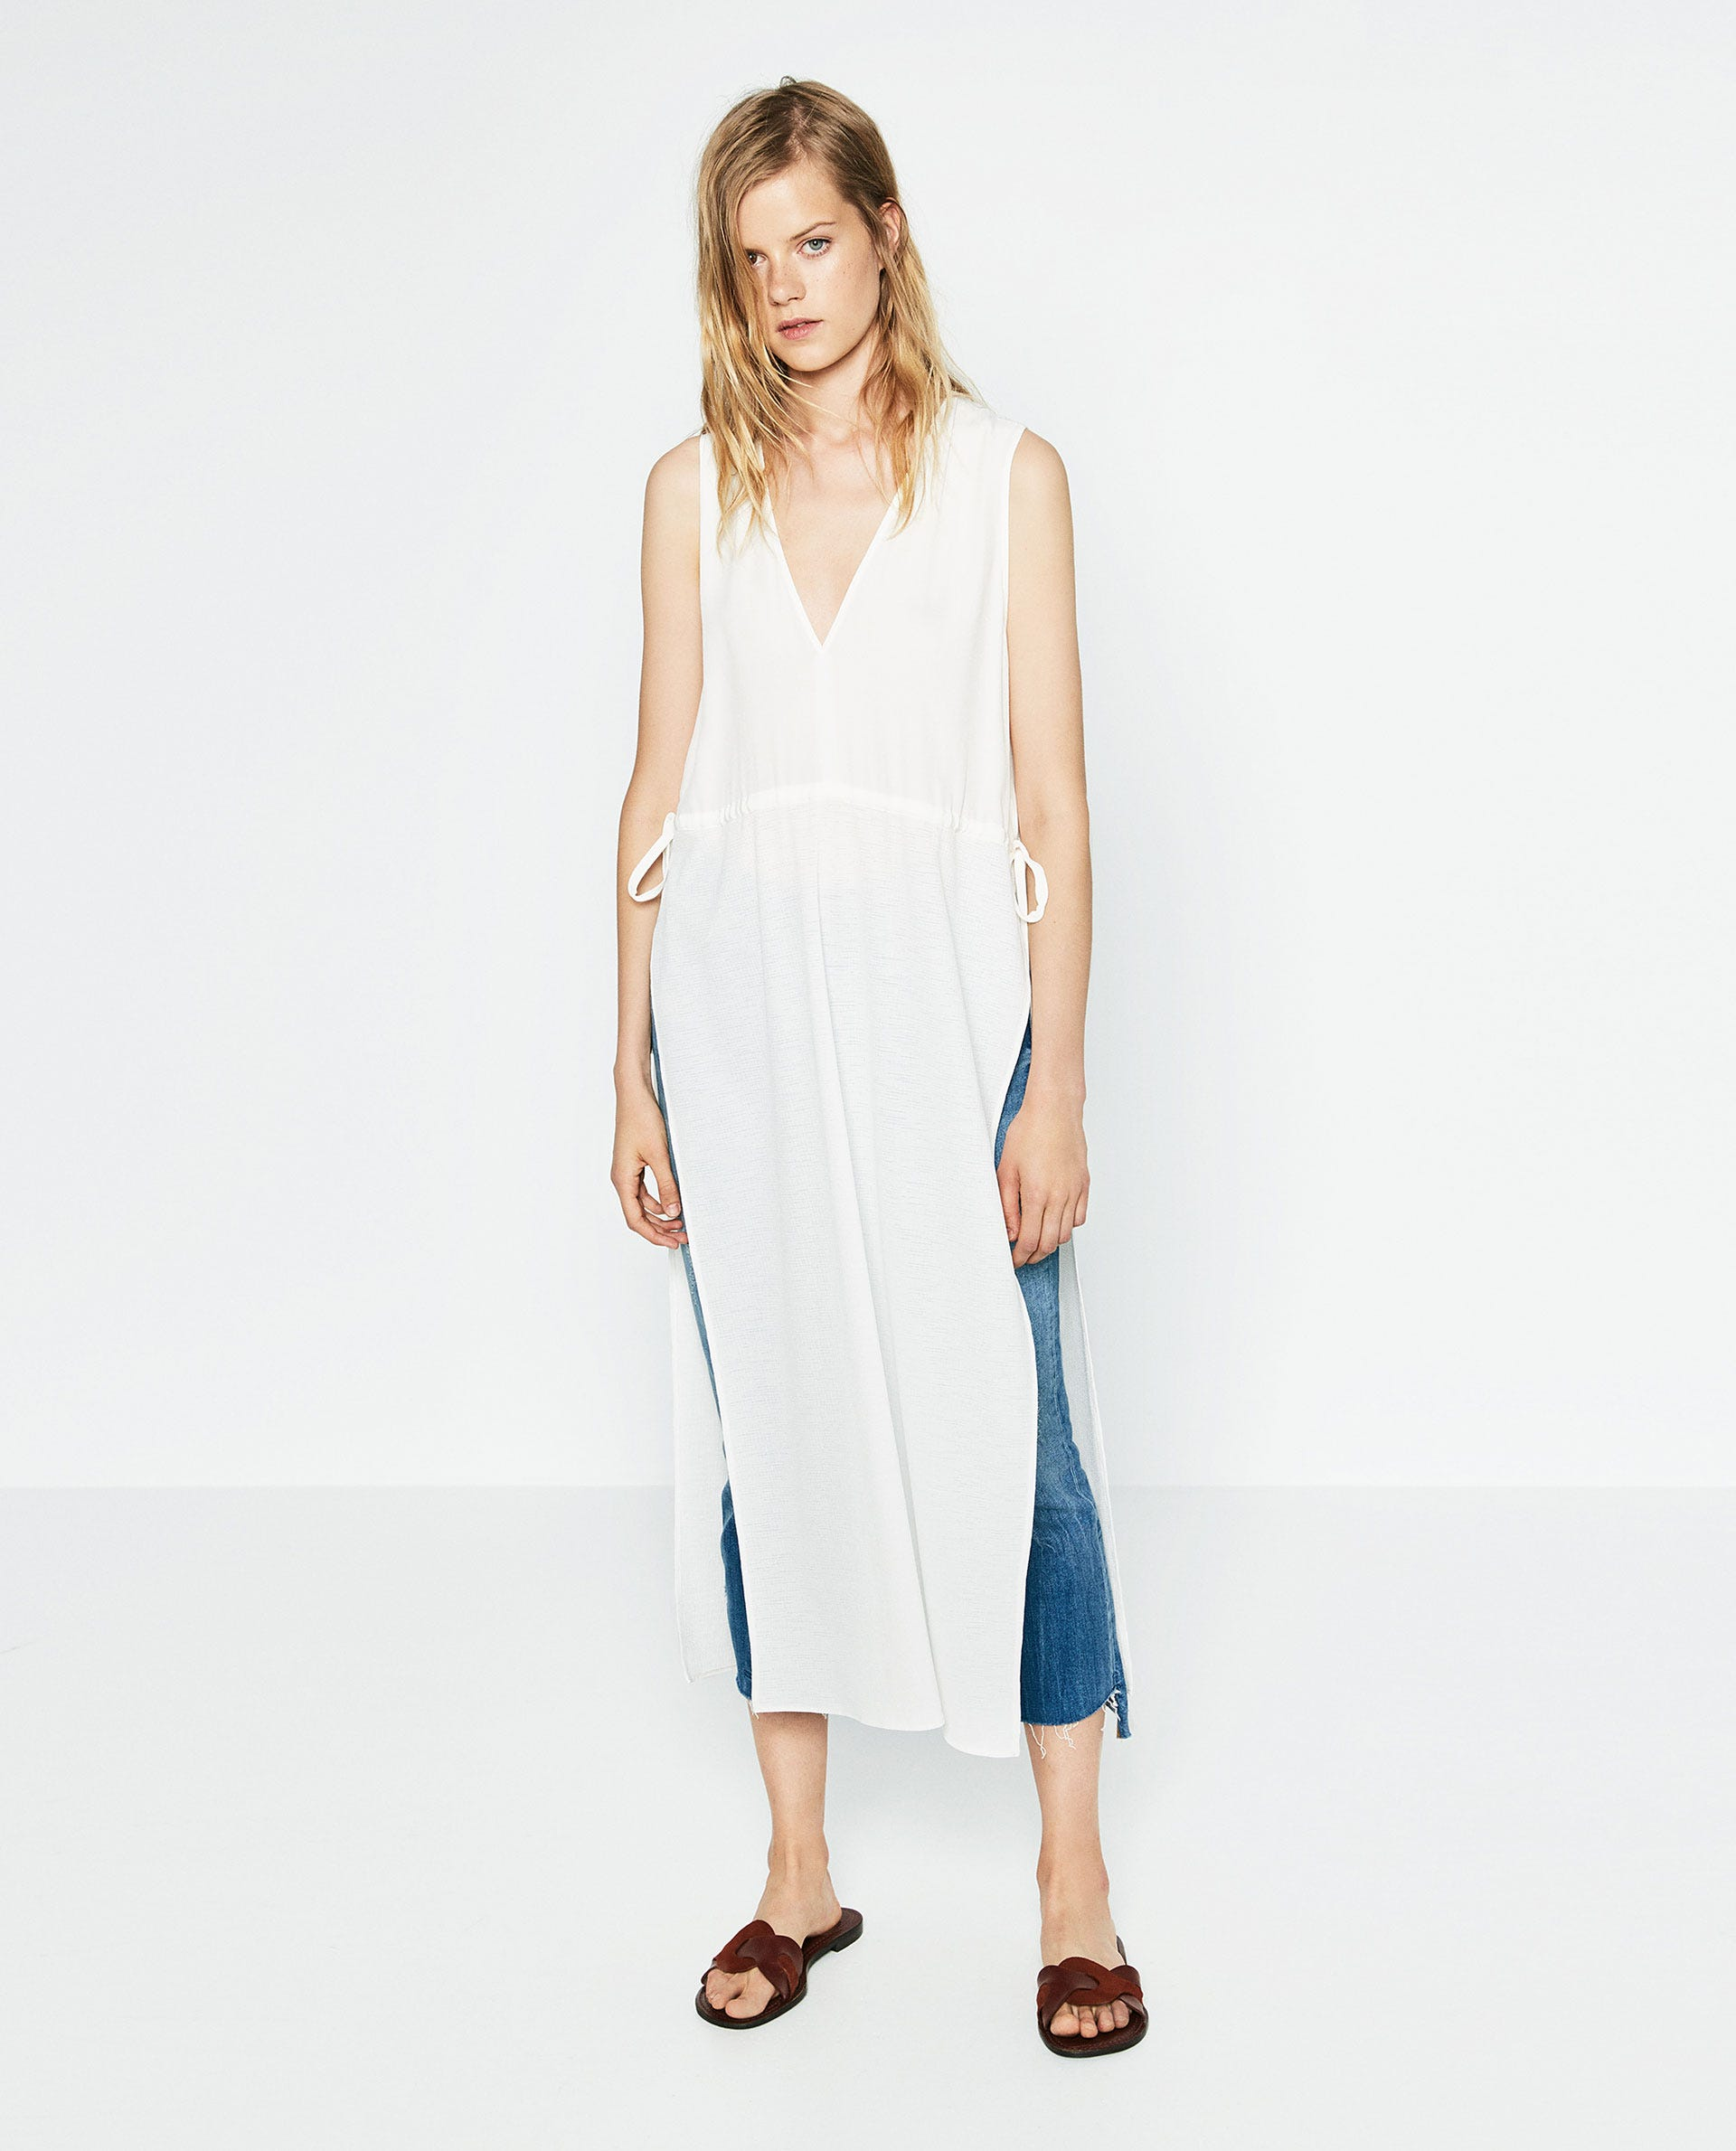 3842e138e12 Zara Spring New Arrivals Dresses Sandals Accessories